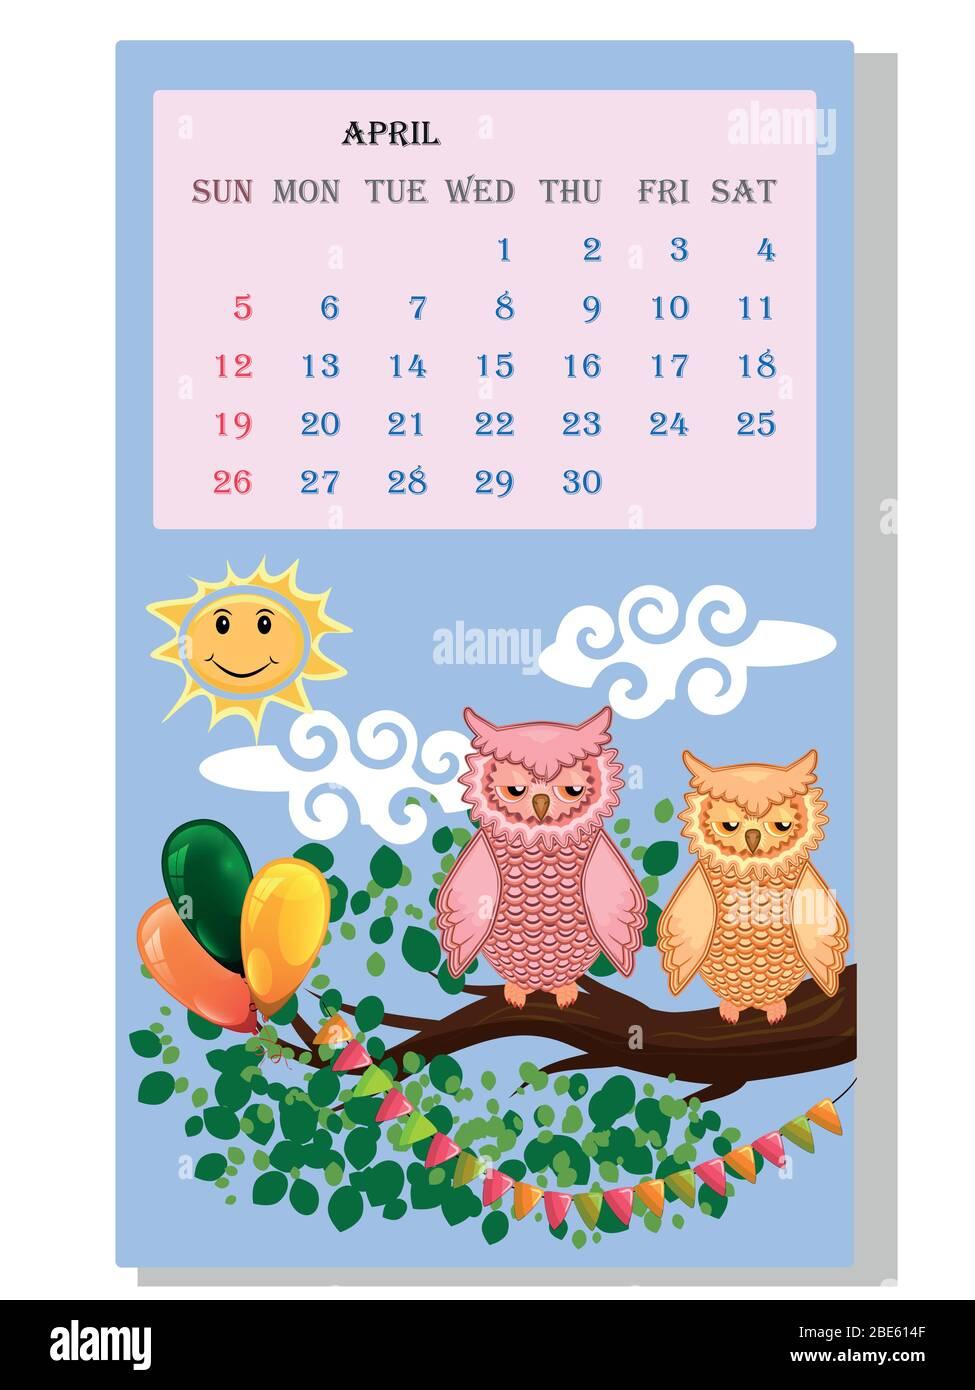 Calendario 2021. Calendario carino con simpatici vignette gufi